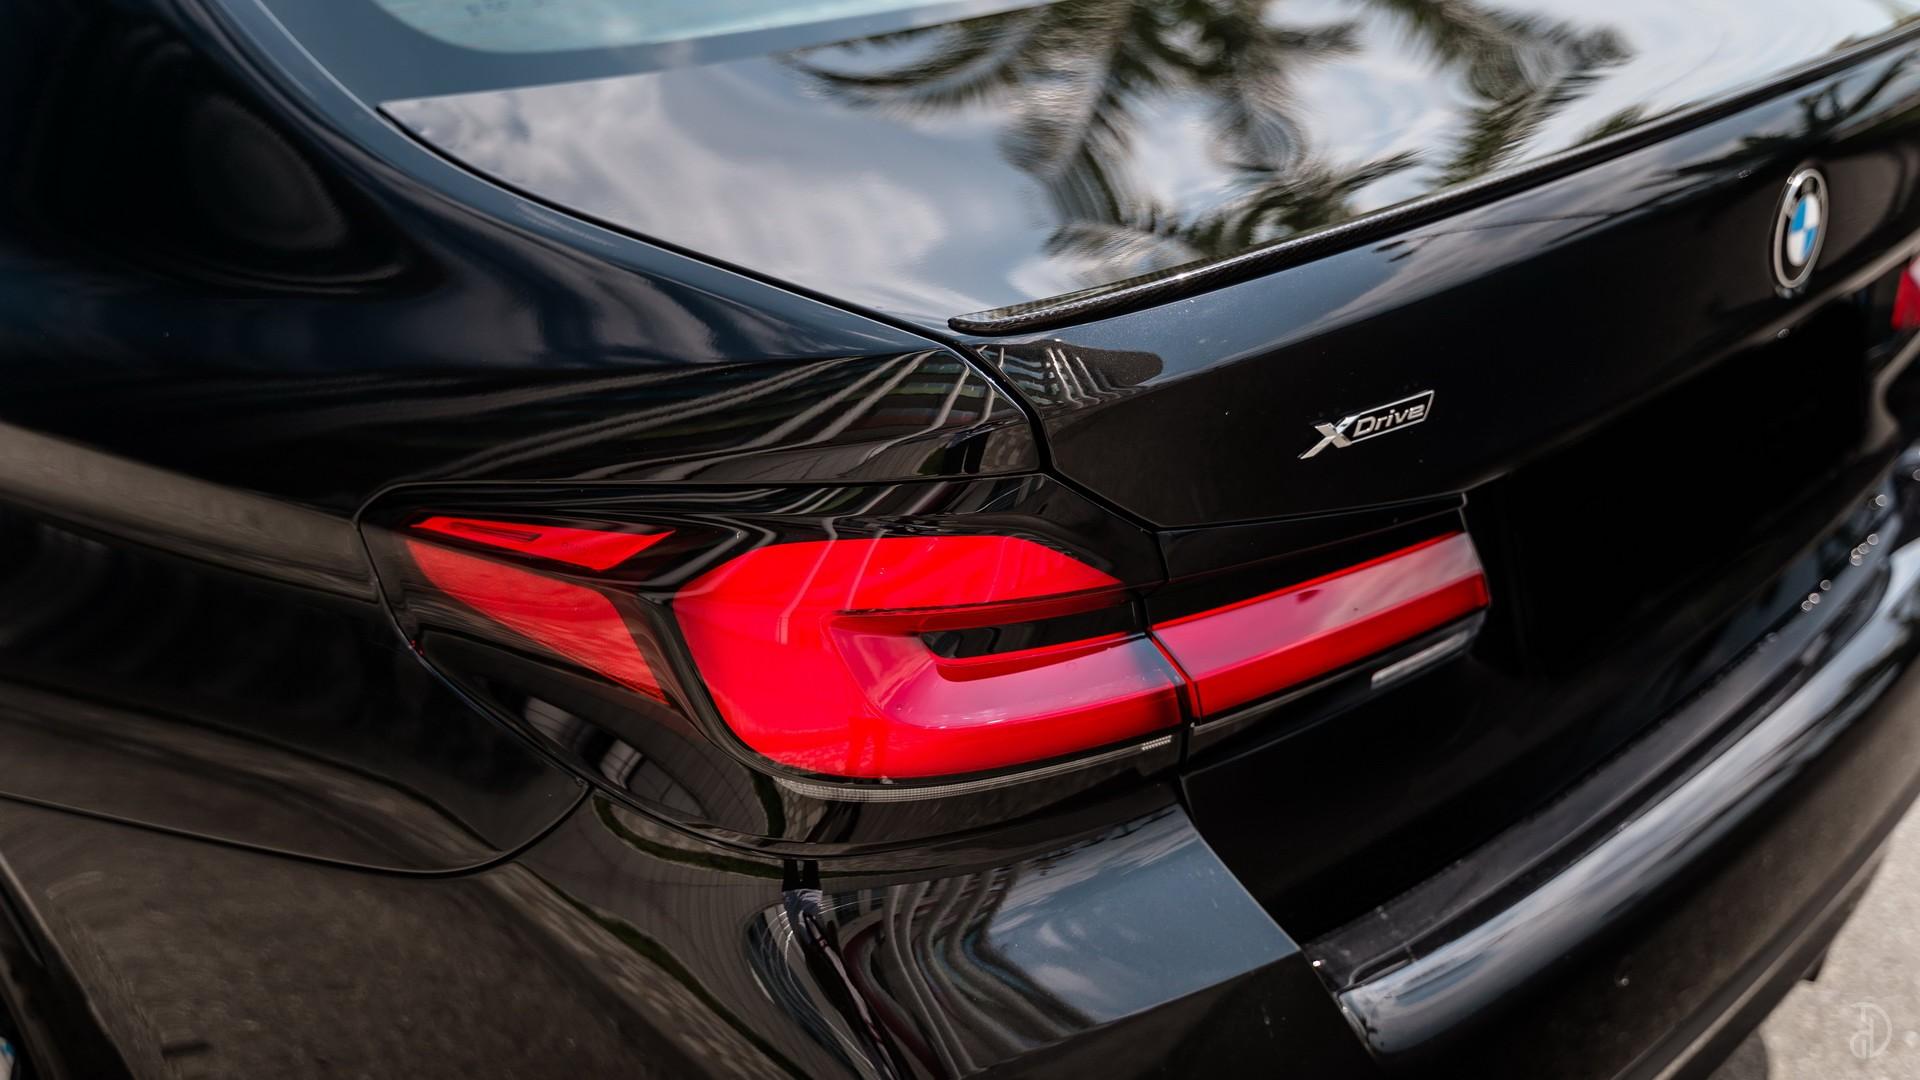 Аренда BMW 520d G30 в Сочи. Фото 8